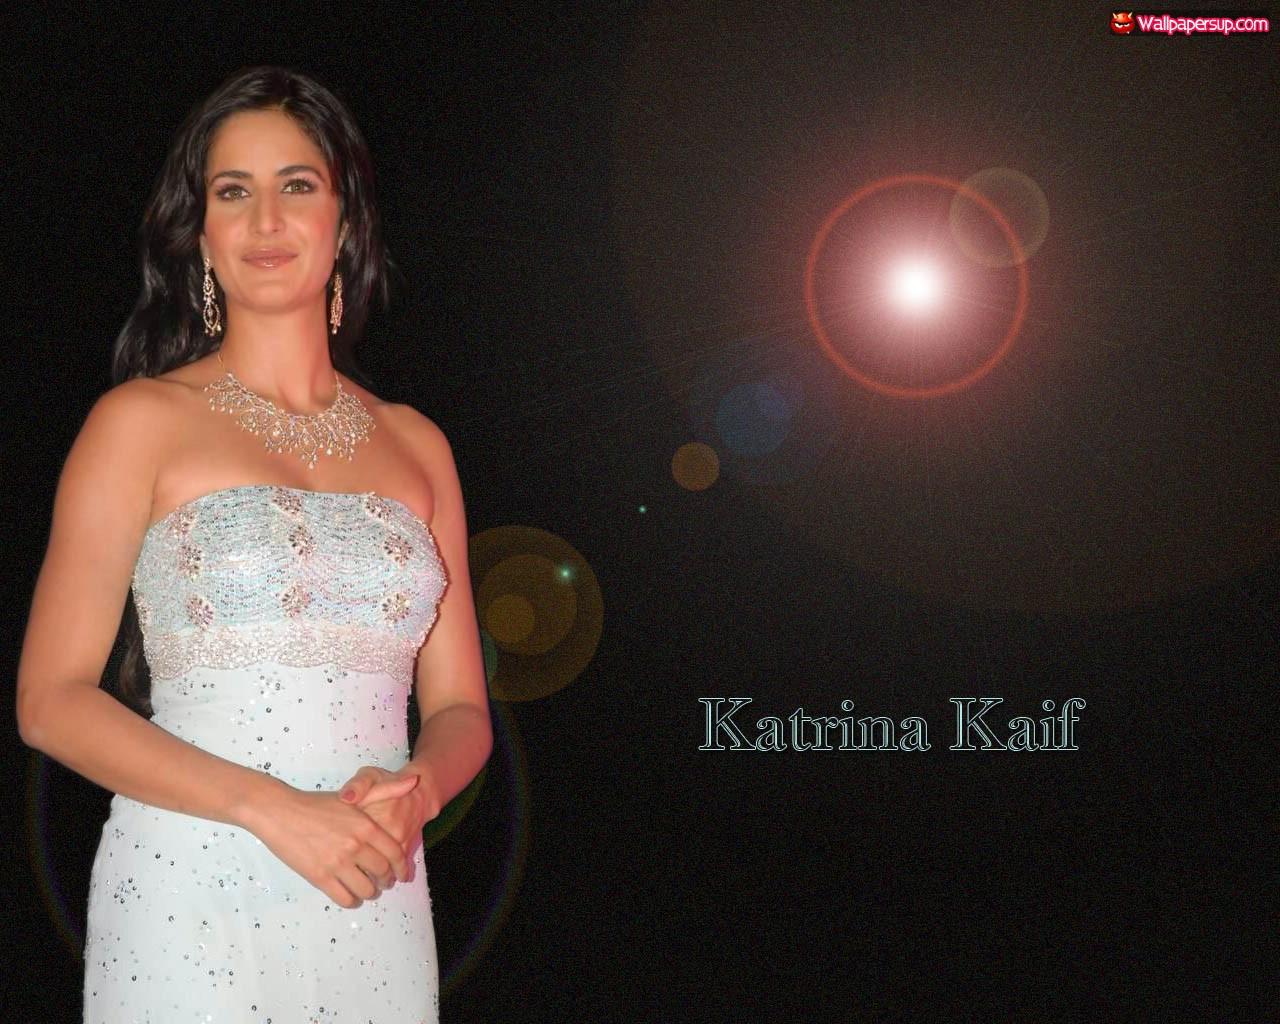 Calendar Rakhi : Katrina kaif birthday girl in white evening gown